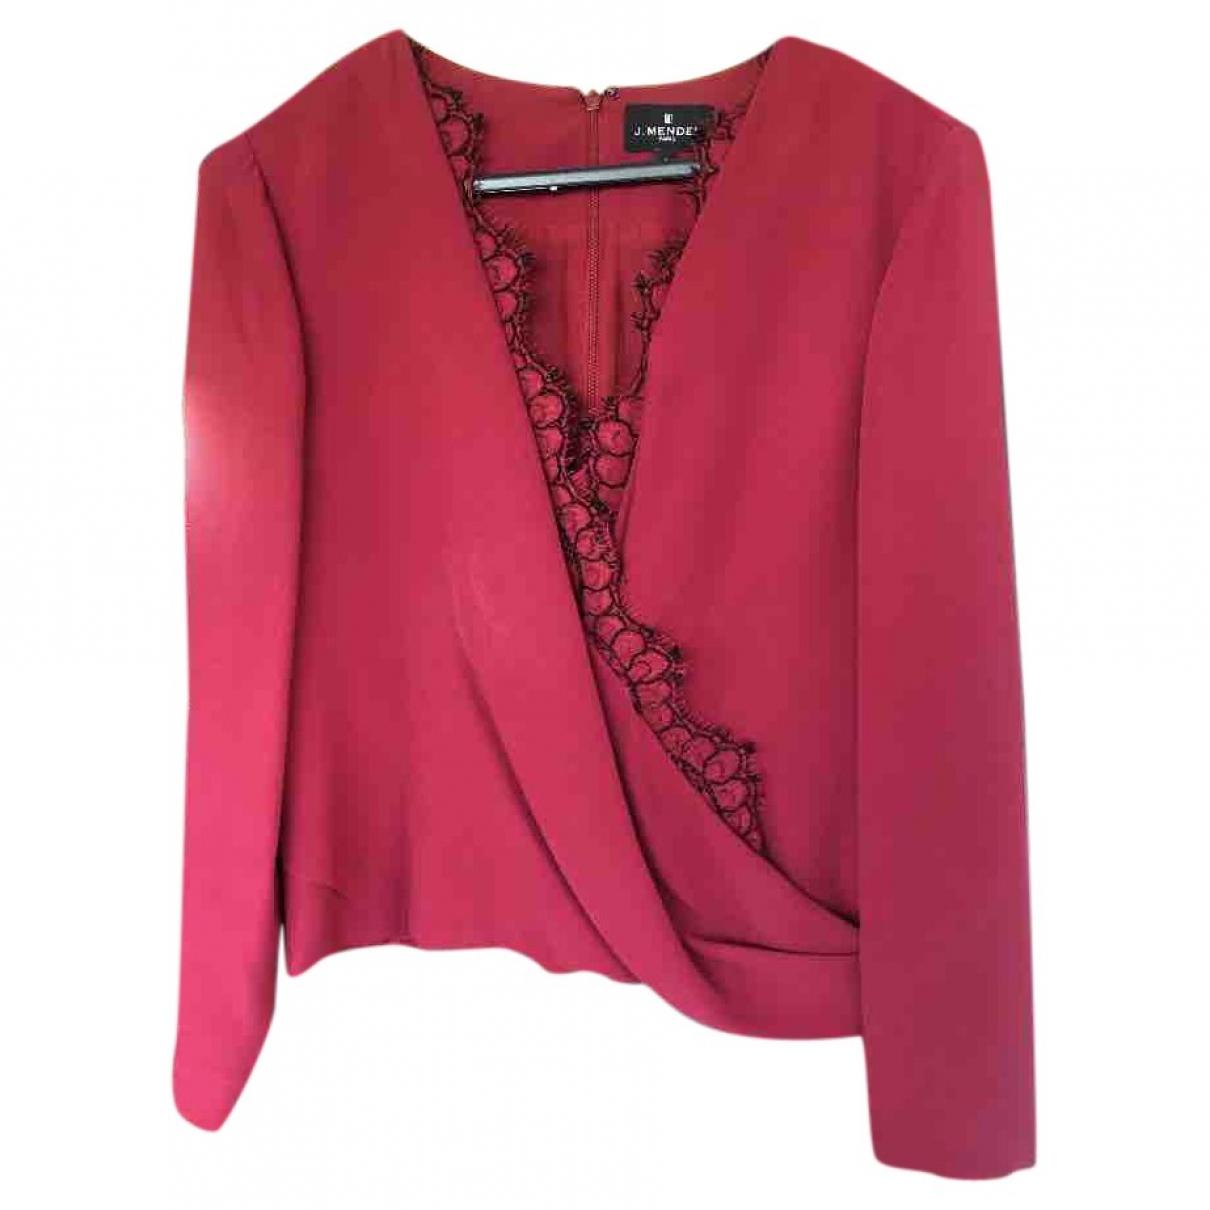 J.mendel \N Burgundy Silk  top for Women 6 US